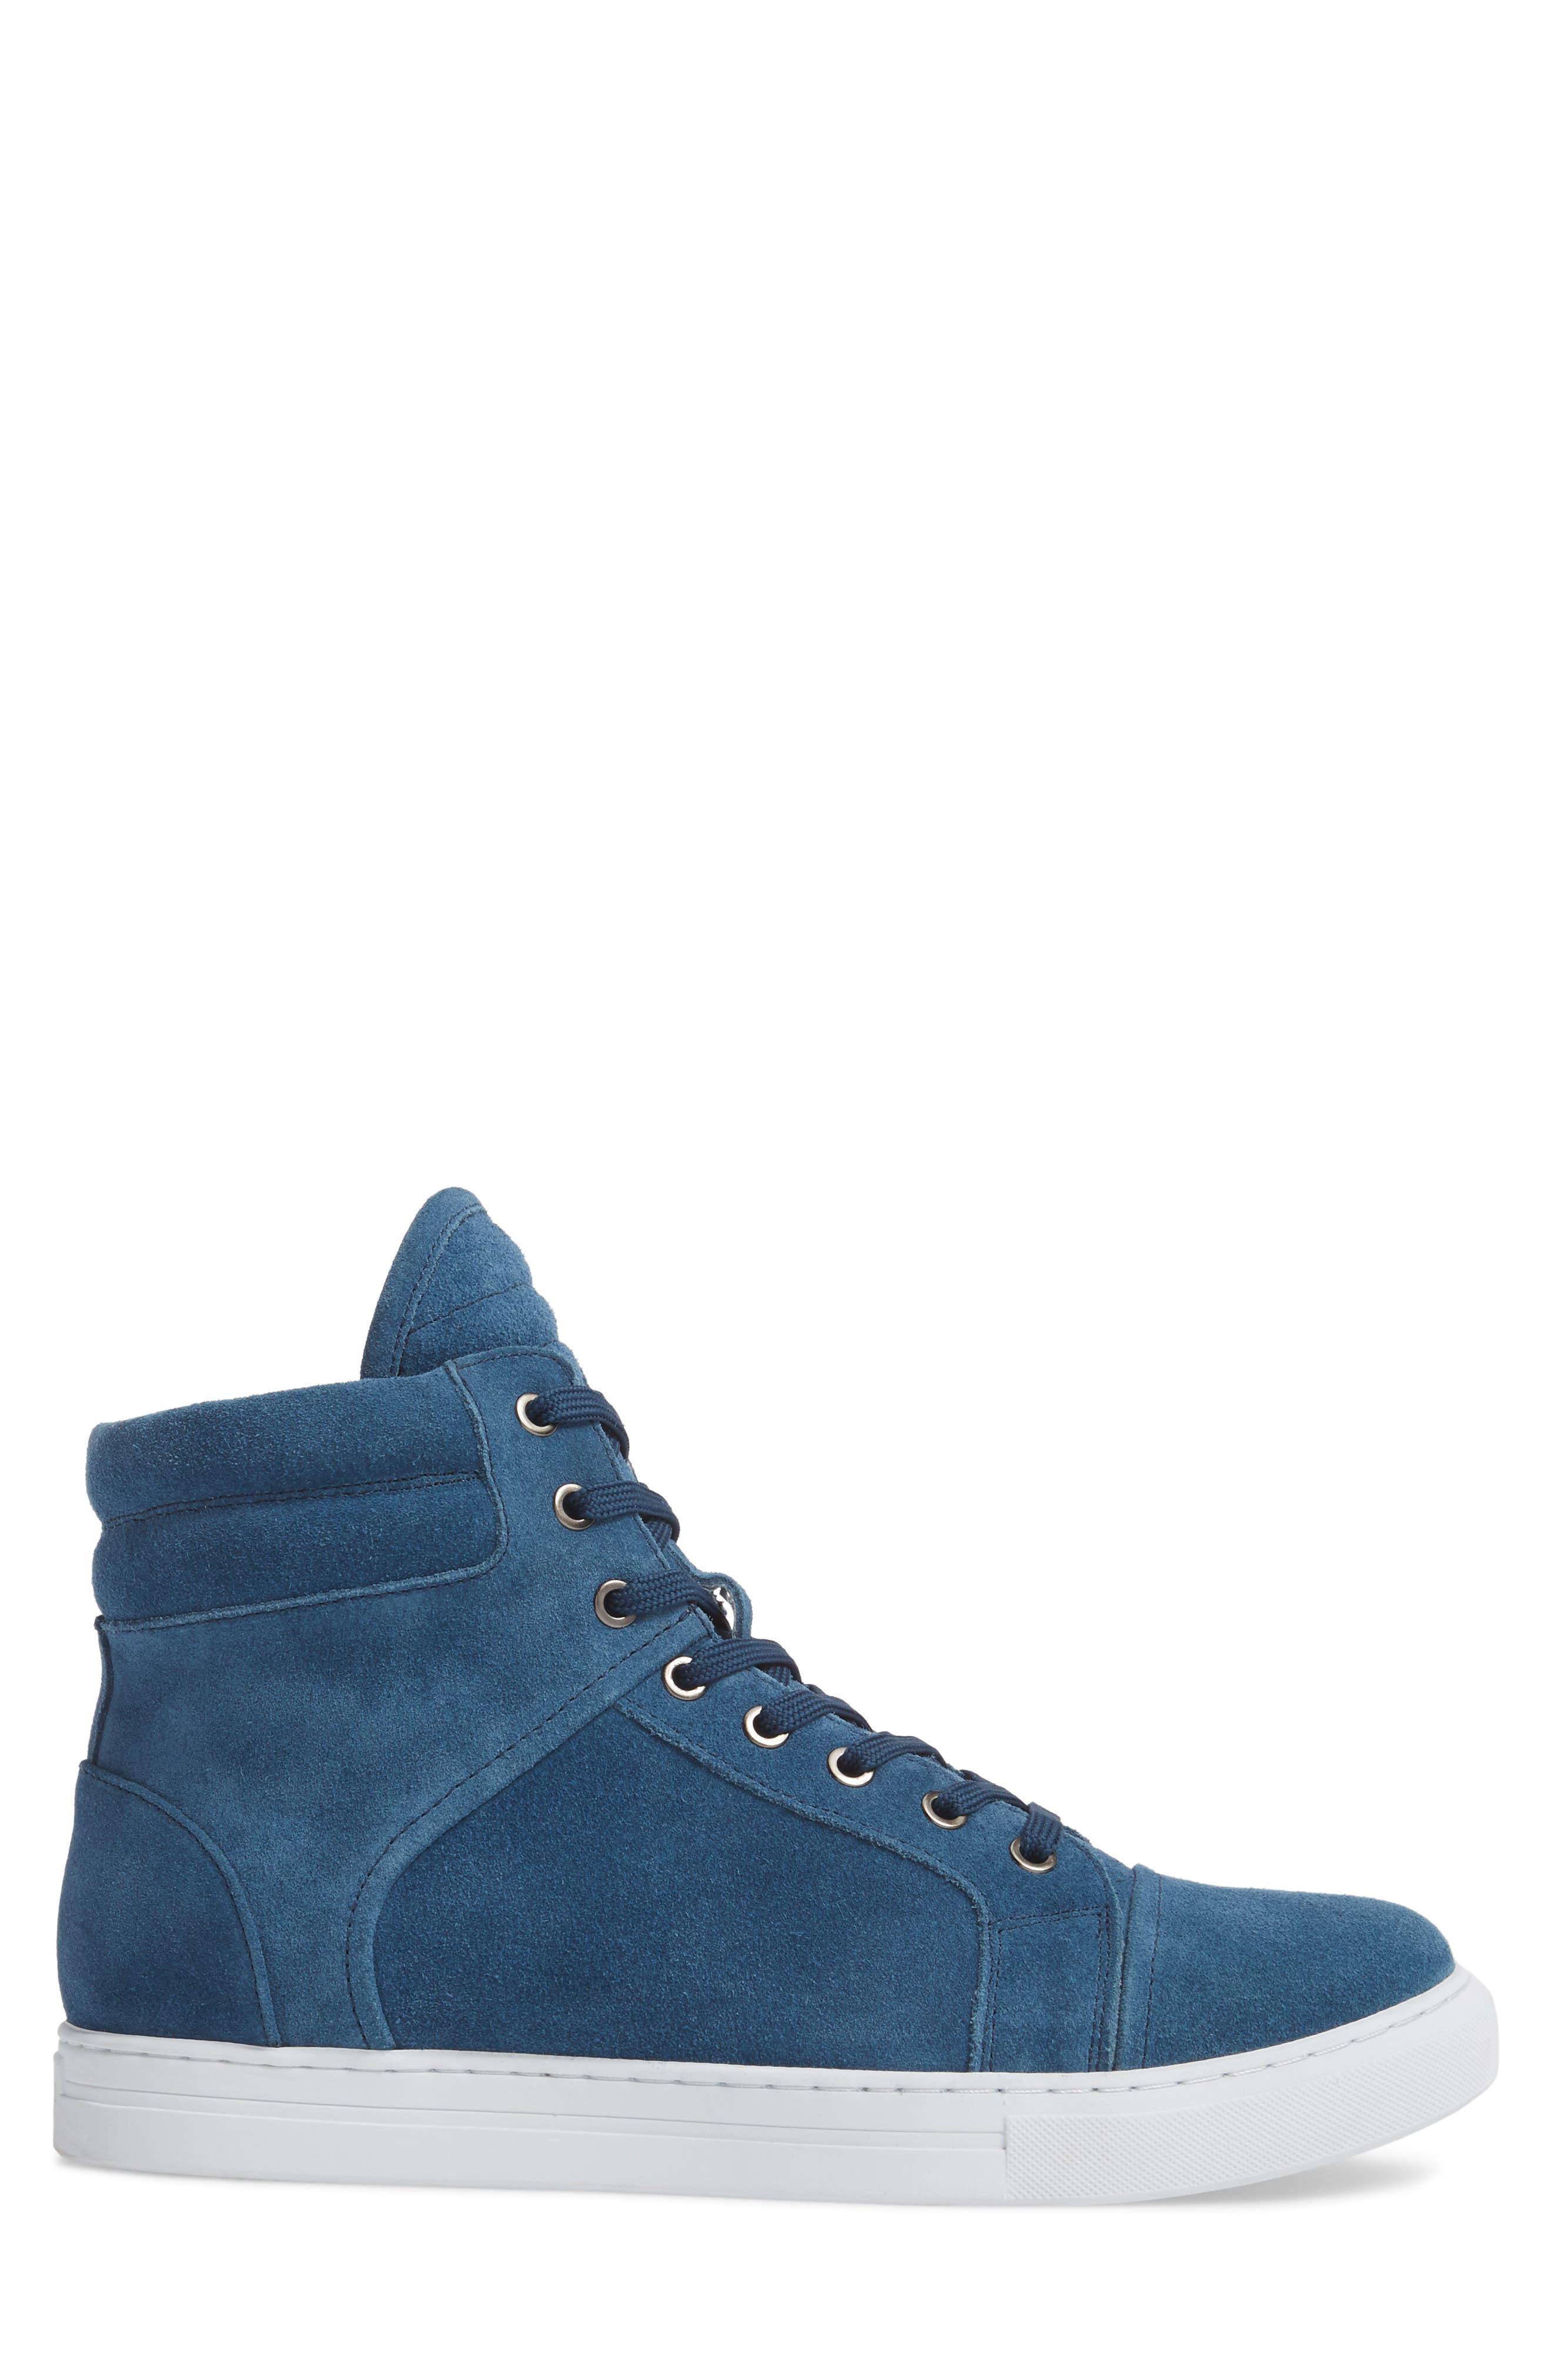 Double Header Sneaker,                             Alternate thumbnail 3, color,                             Blue Suede